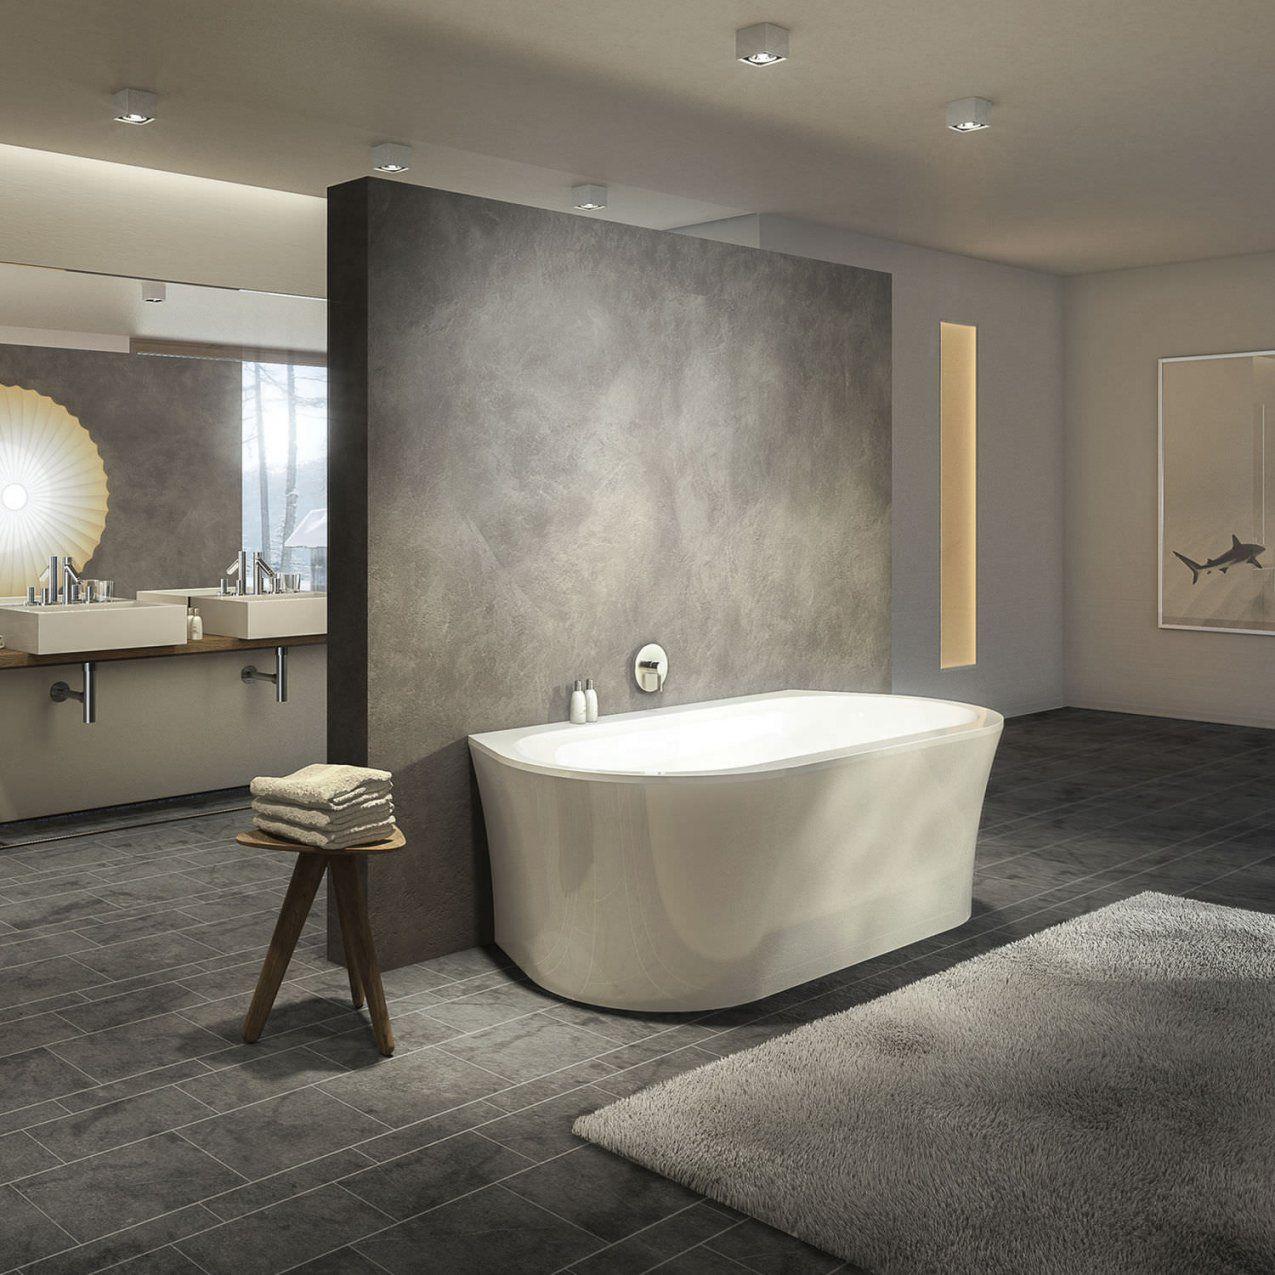 Freistehende Badewanne  Oval  Aus Acryl  Primeline Wall von Freistehende Badewanne An Wand Bild